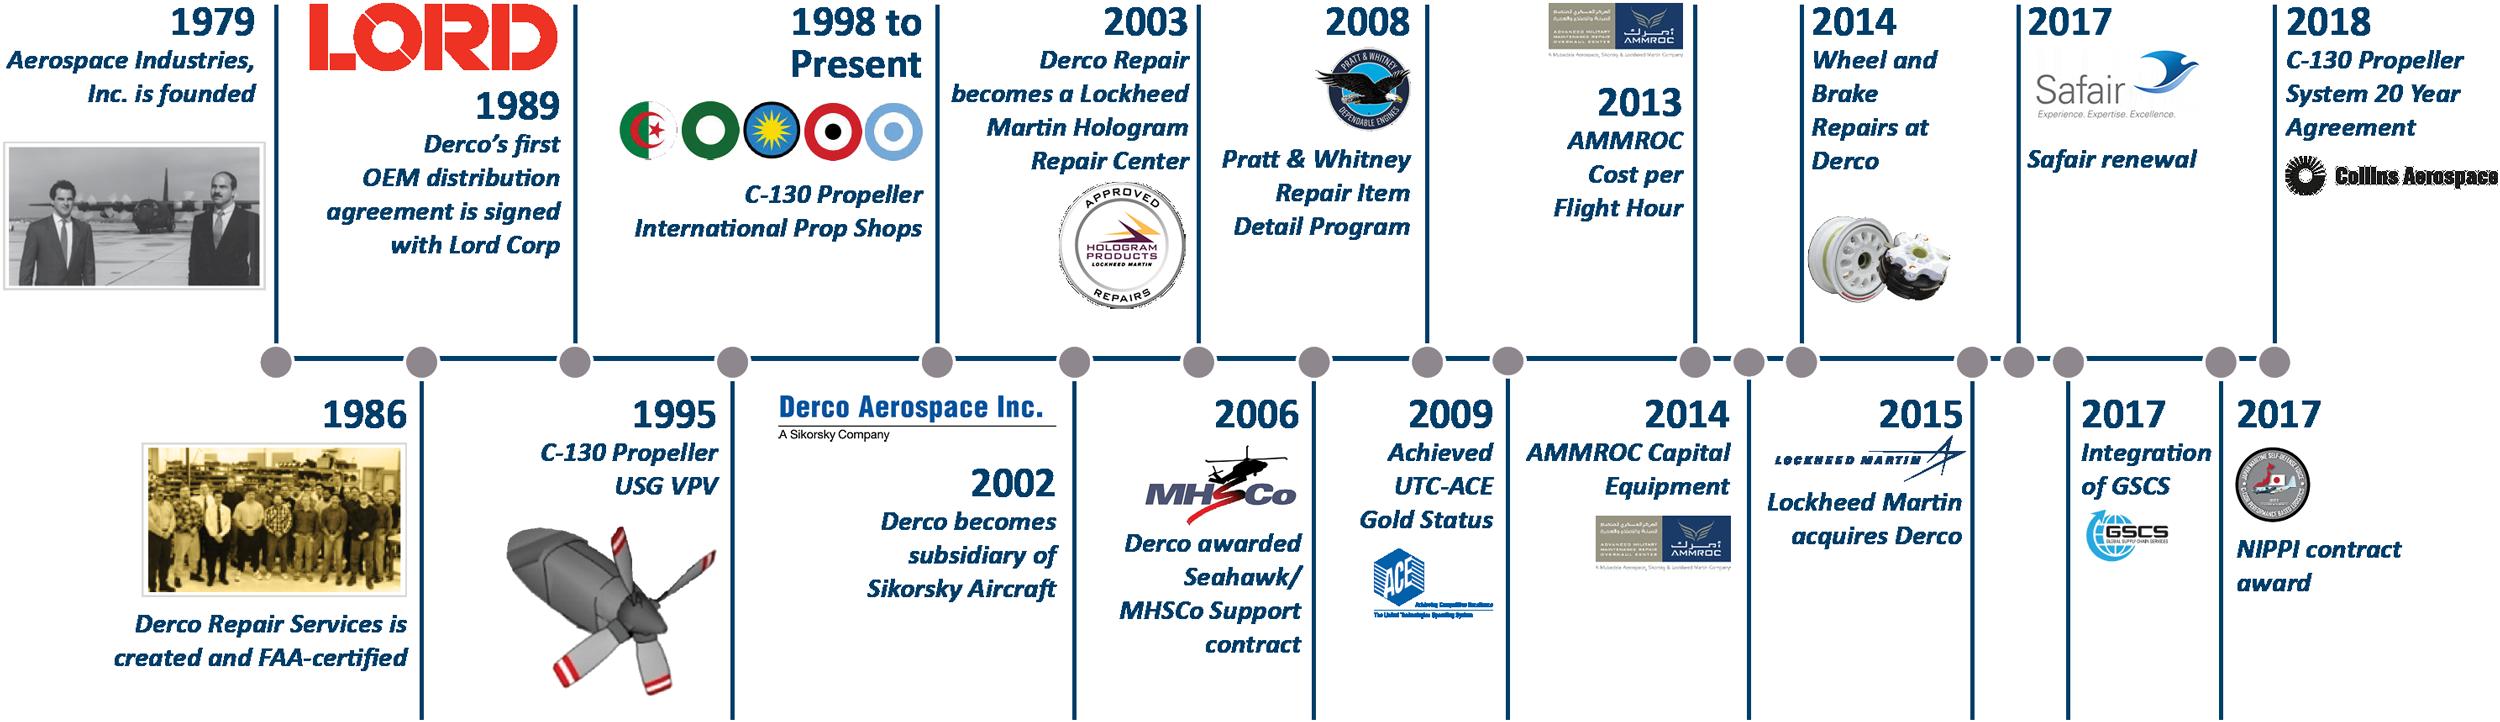 Derco Aerospace Lockheed Martin